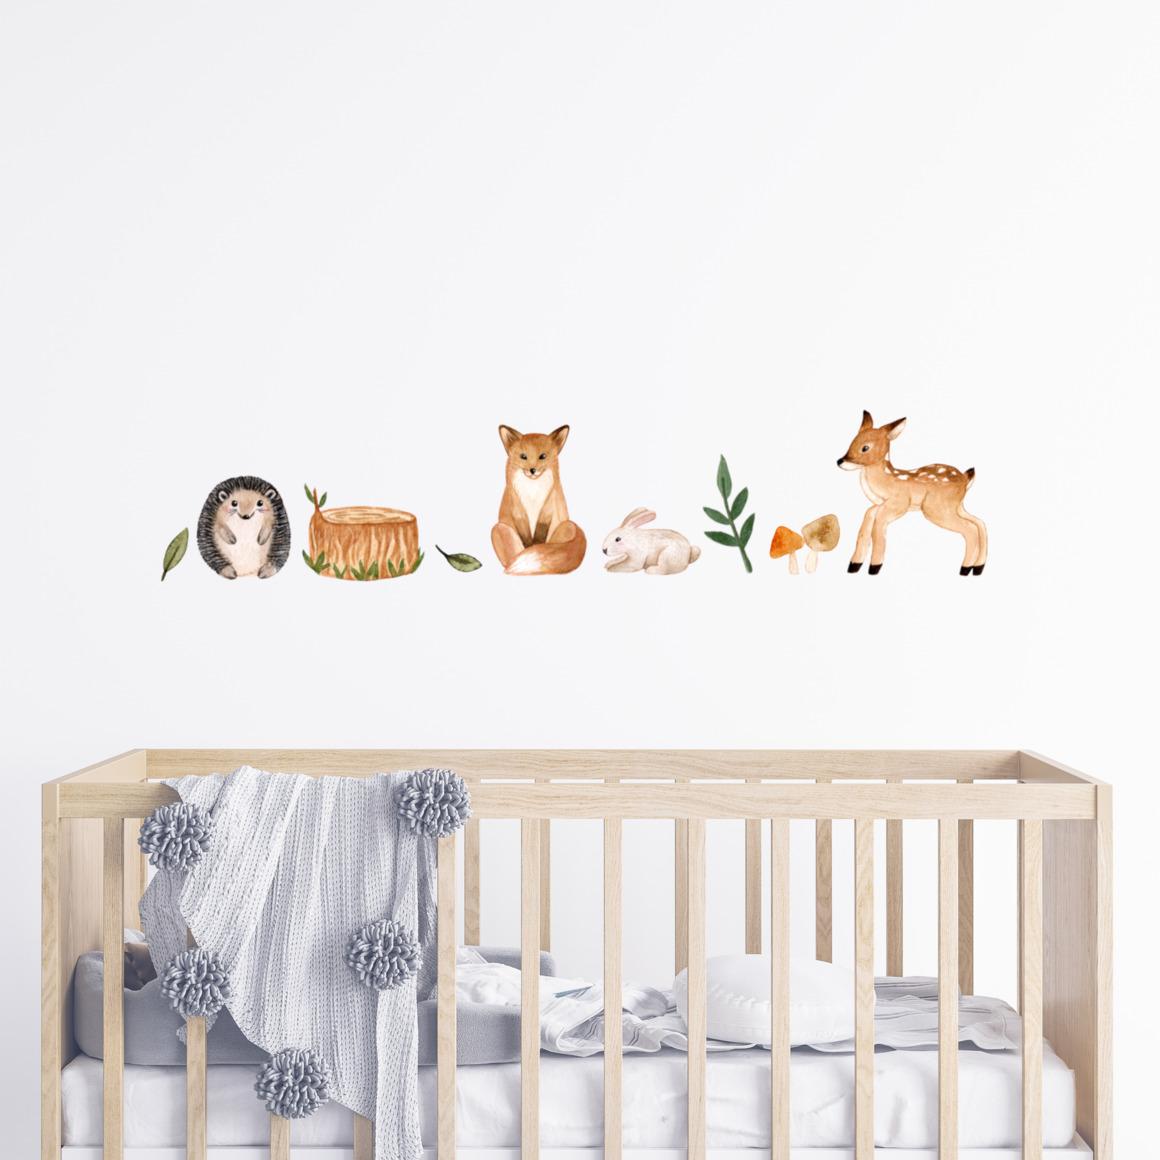 Fabric wall decals - Woodland animals   Trada Marketplace